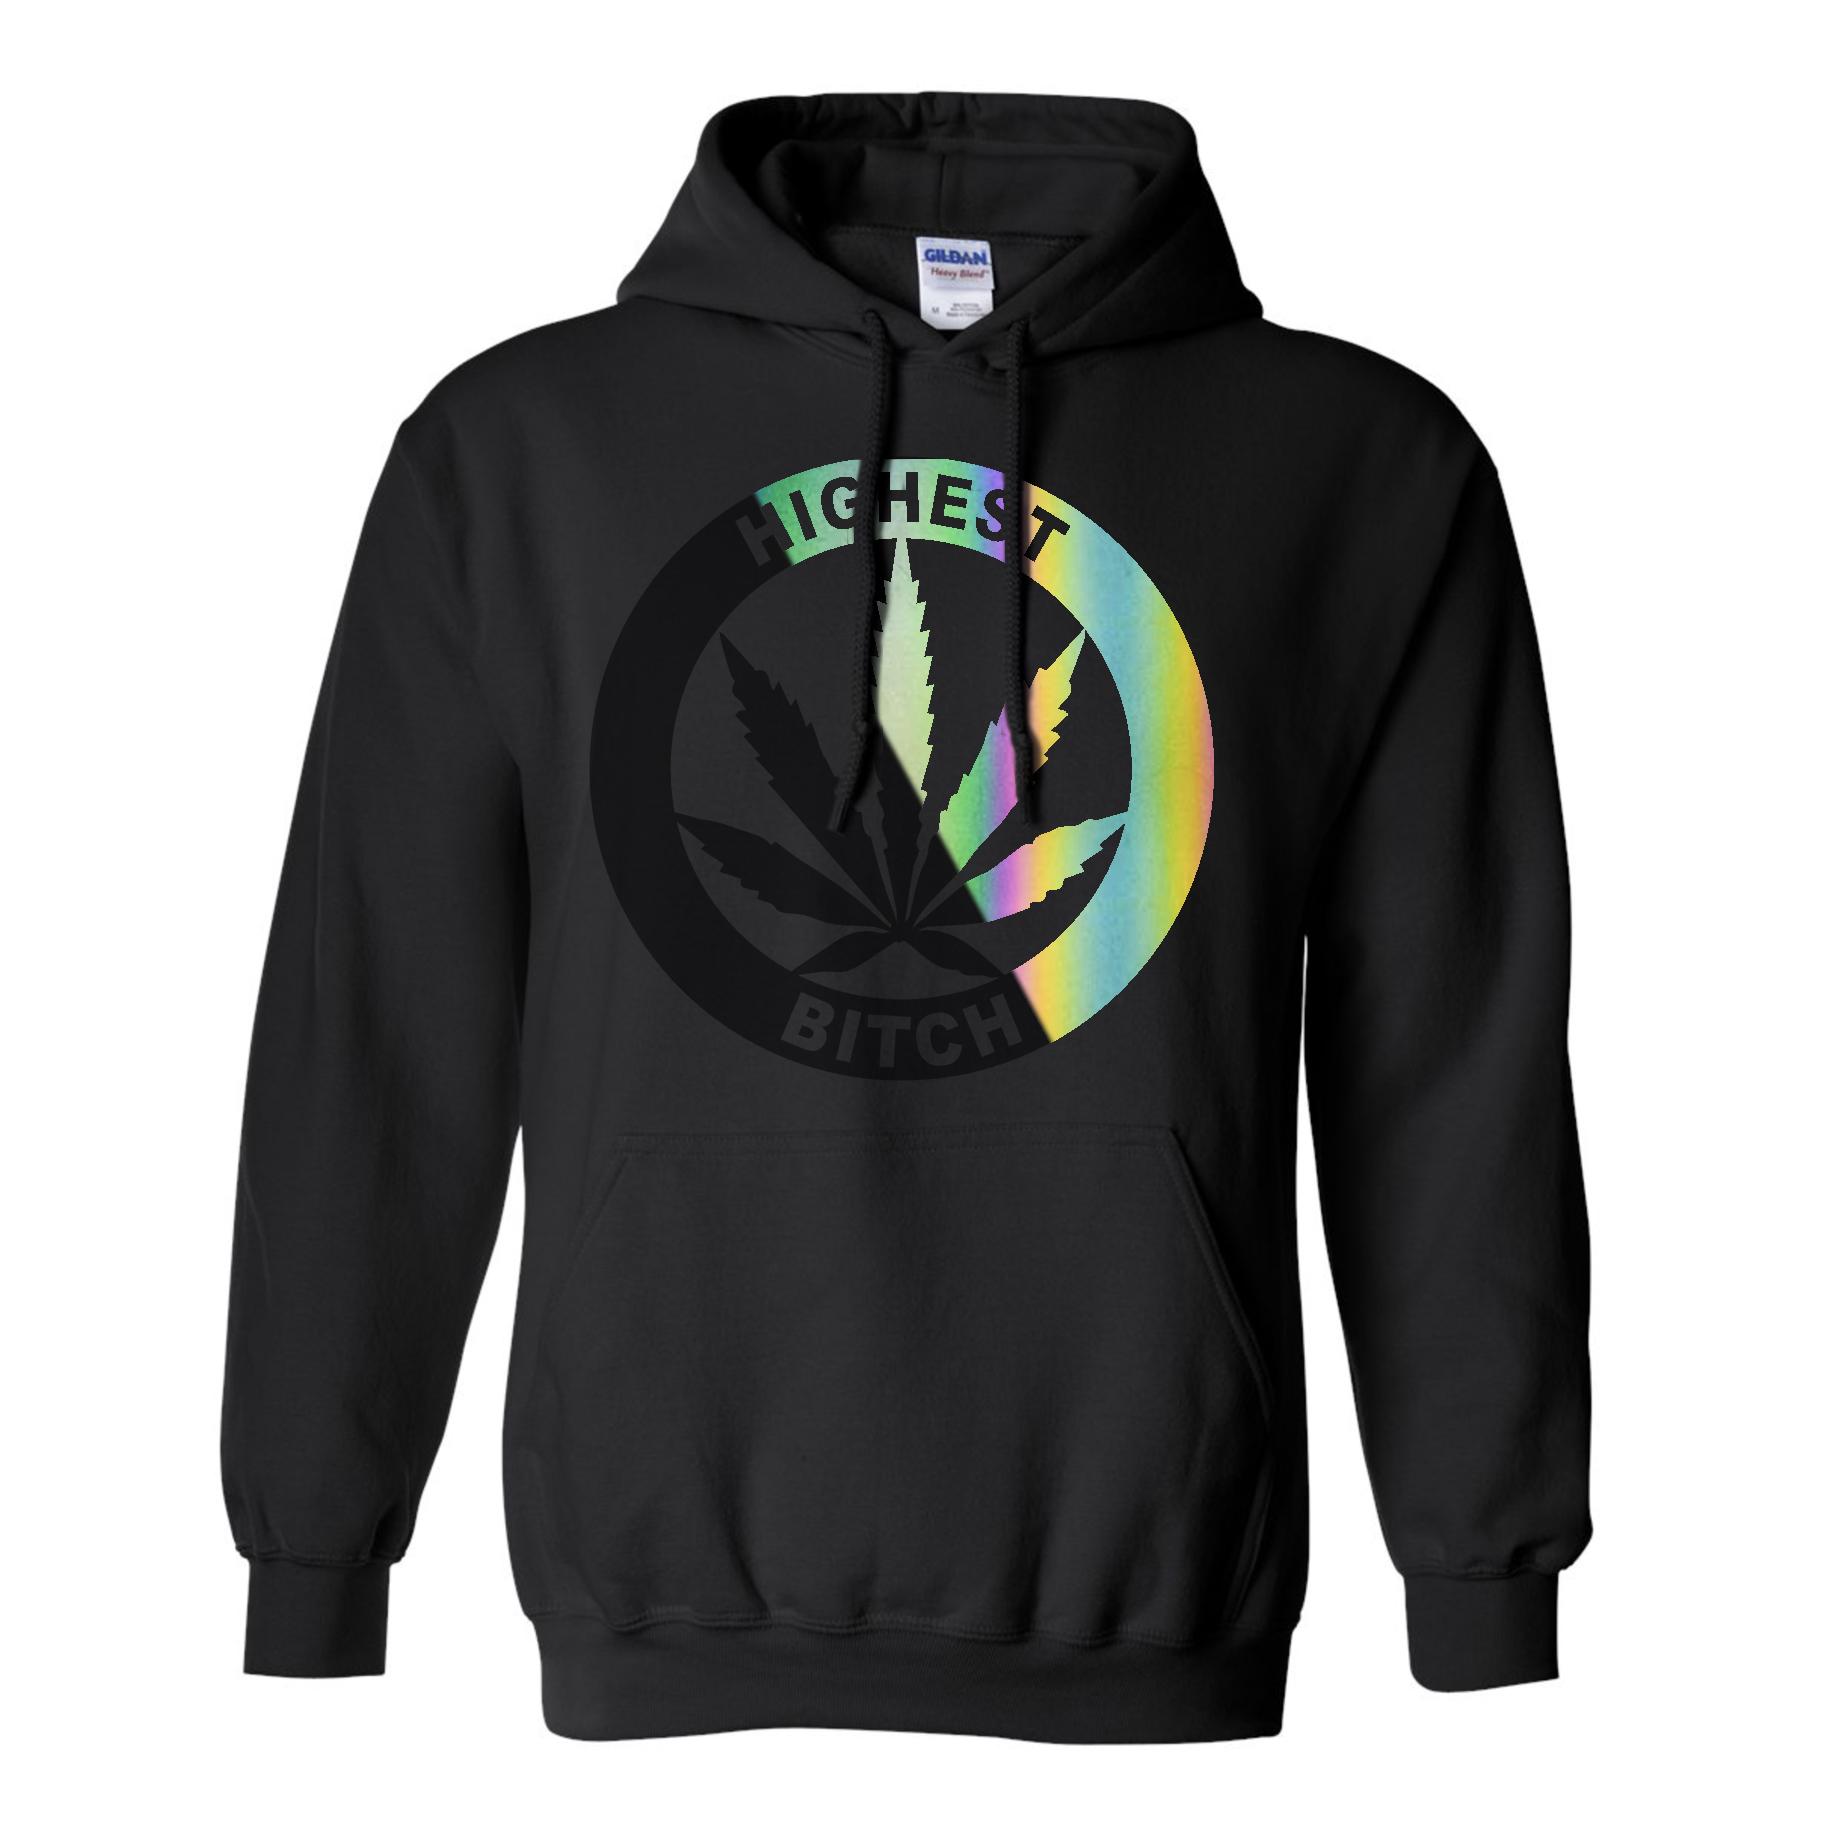 just get high_highest bitch logo_black on black chameleon_rainbow reflective